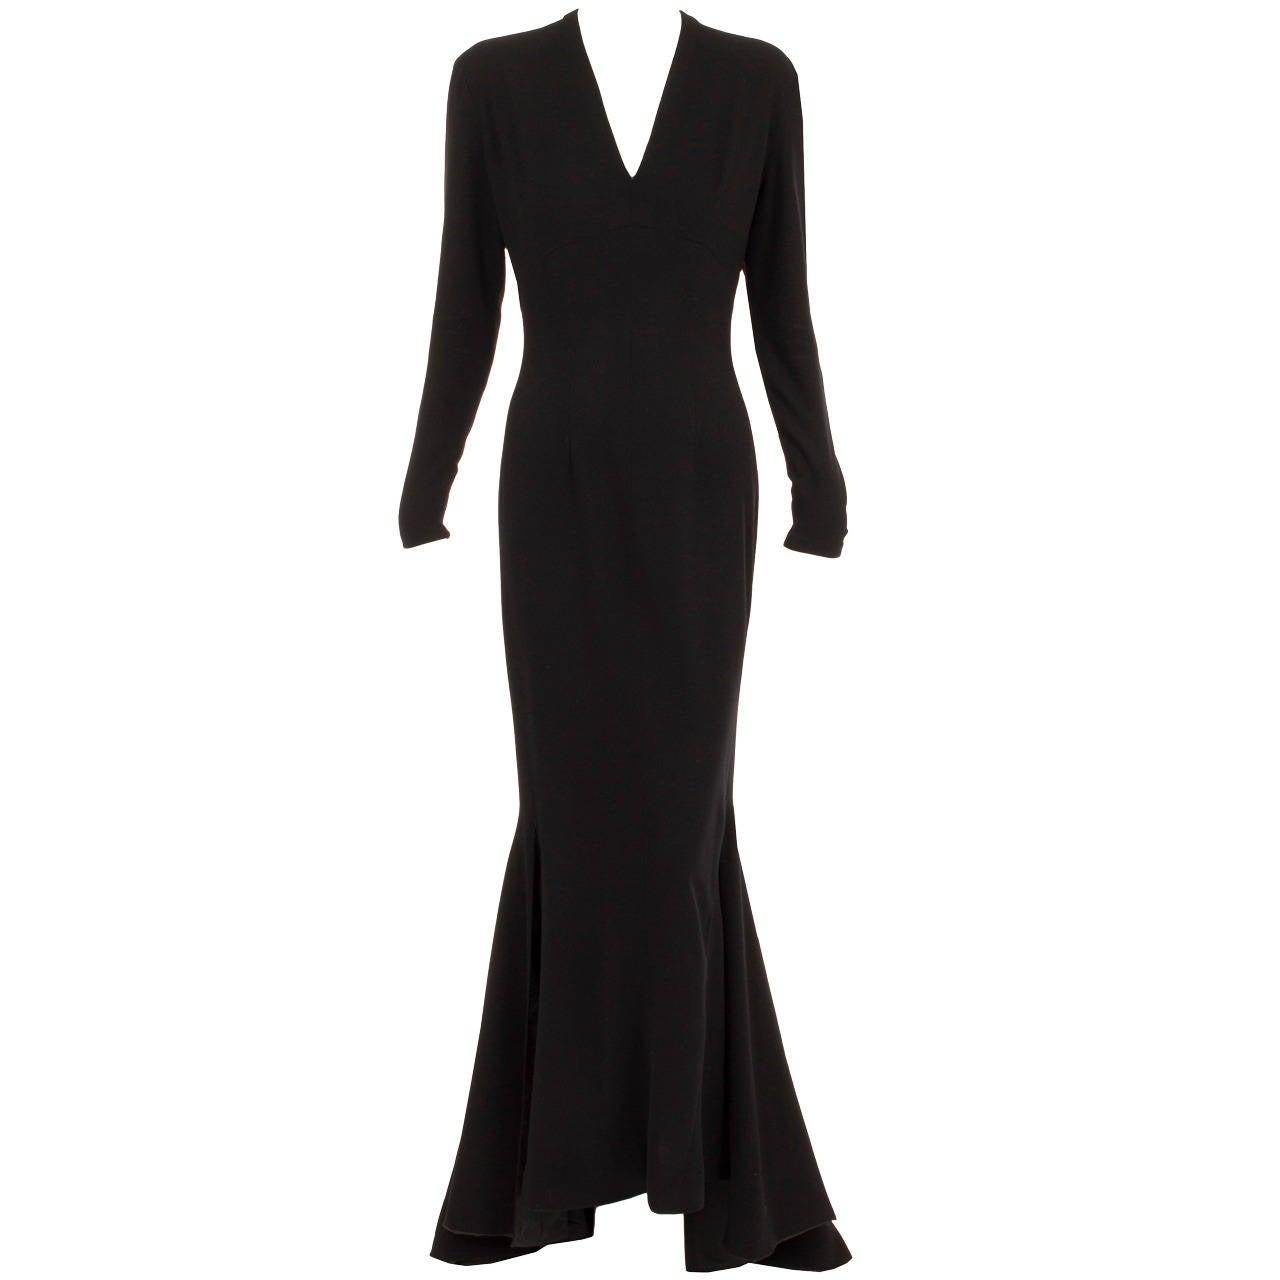 A pierre balmain haute couture dress autumn winter 1948 for Haute couture dress price